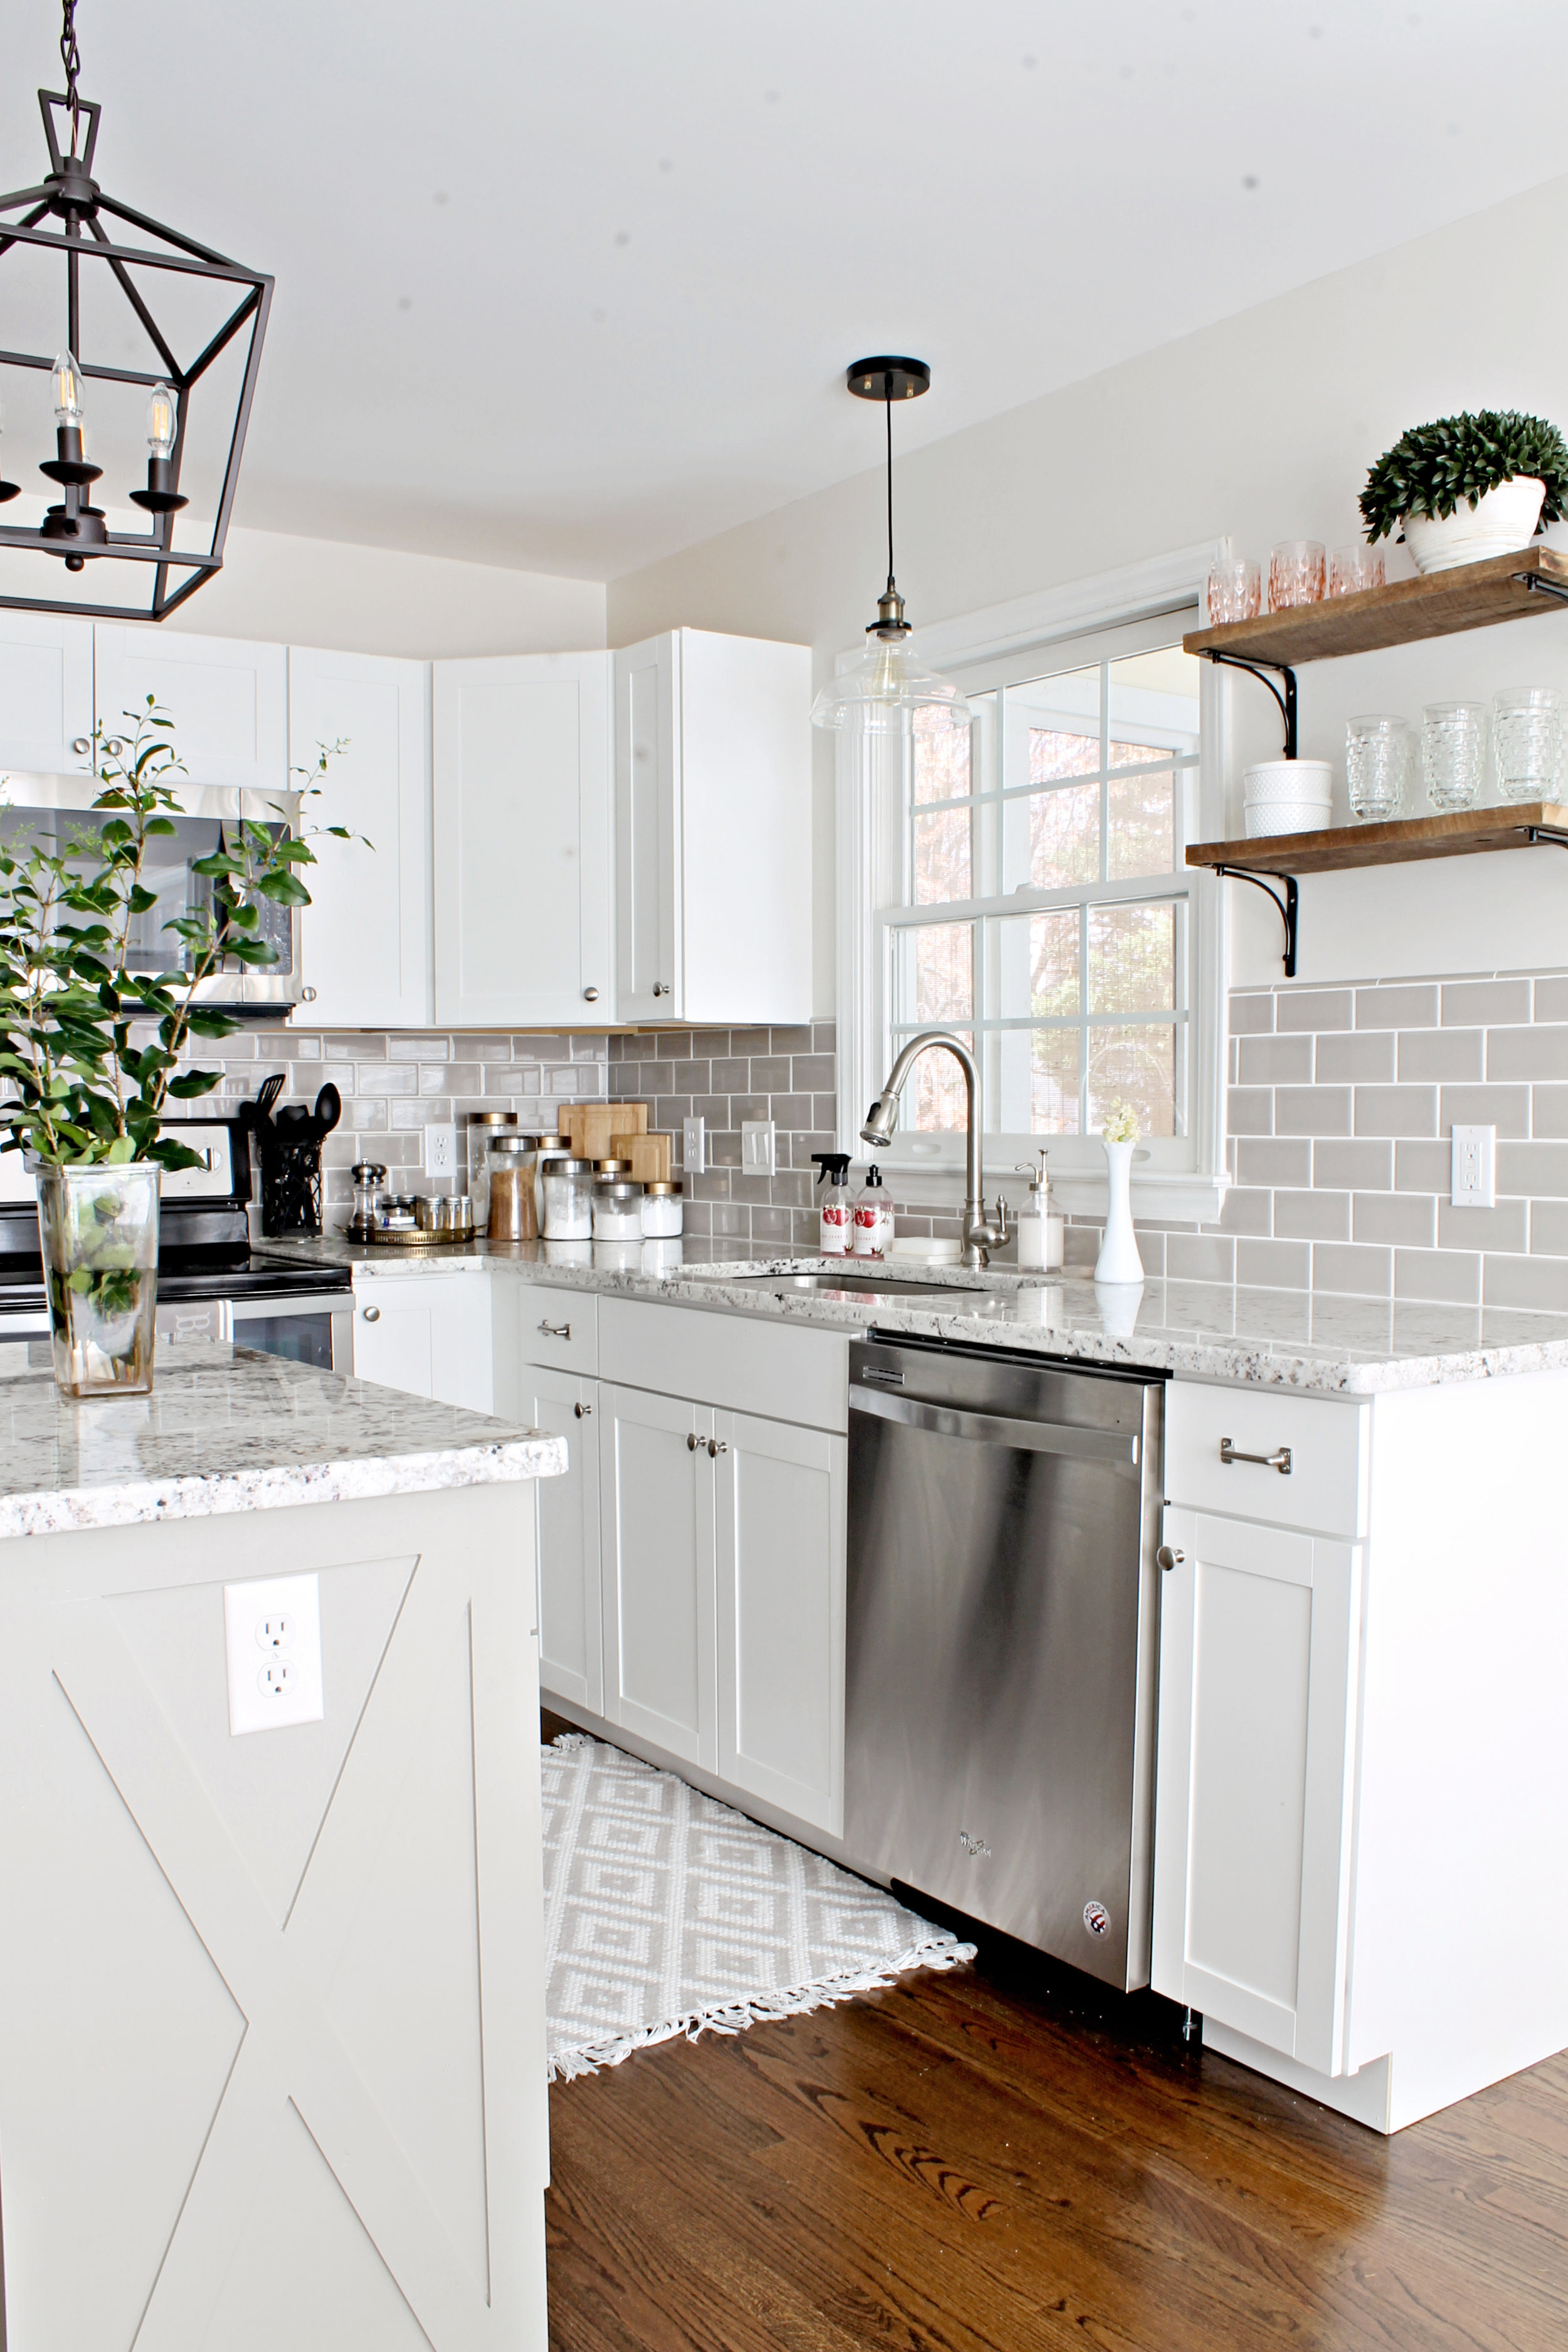 Elizabeth Burns | DIY Kitchen Island Makeover X Trim and Shiplap - Sherwin Williams Dorian Gray and Benjamin Moore Classic Gray Kitchen Remodel